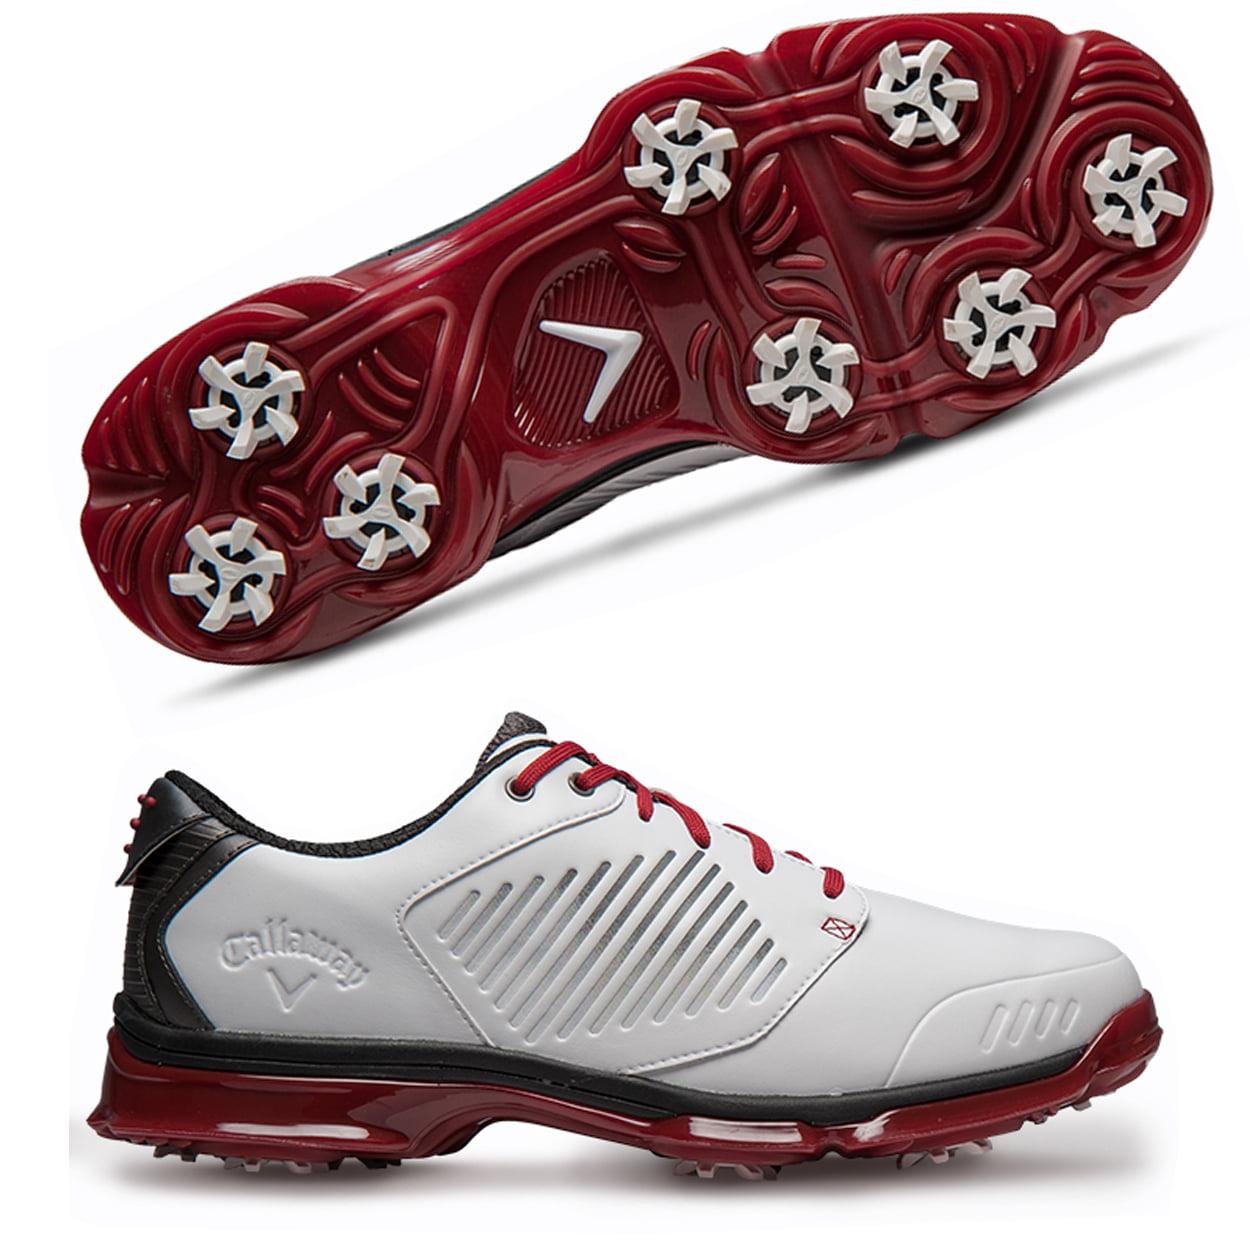 cheap for discount low priced arriving Callaway Xfer Nitro Men's Golf Shoe - Walmart.com